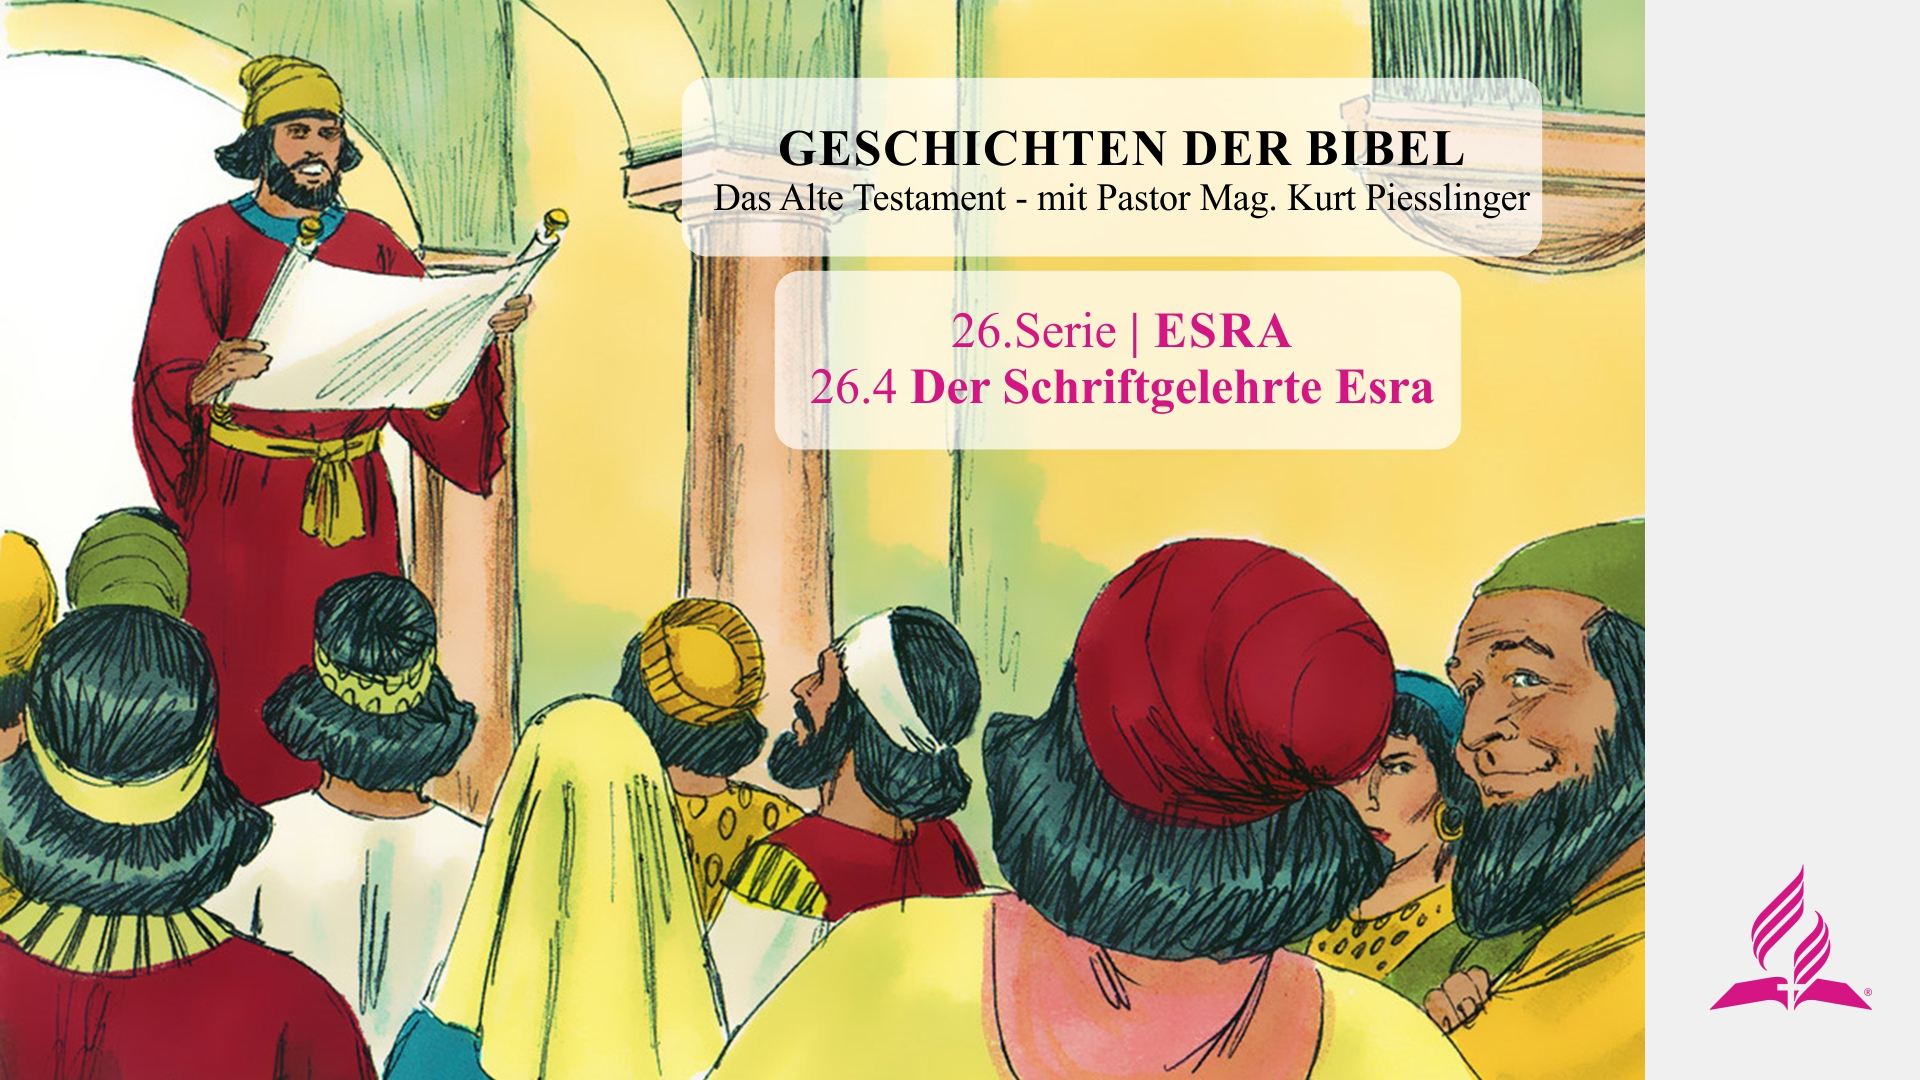 GESCHICHTEN DER BIBEL: 26.4 Der Schriftgelehrte Esra – 26.ESRA | Pastor Mag. Kurt Piesslinger